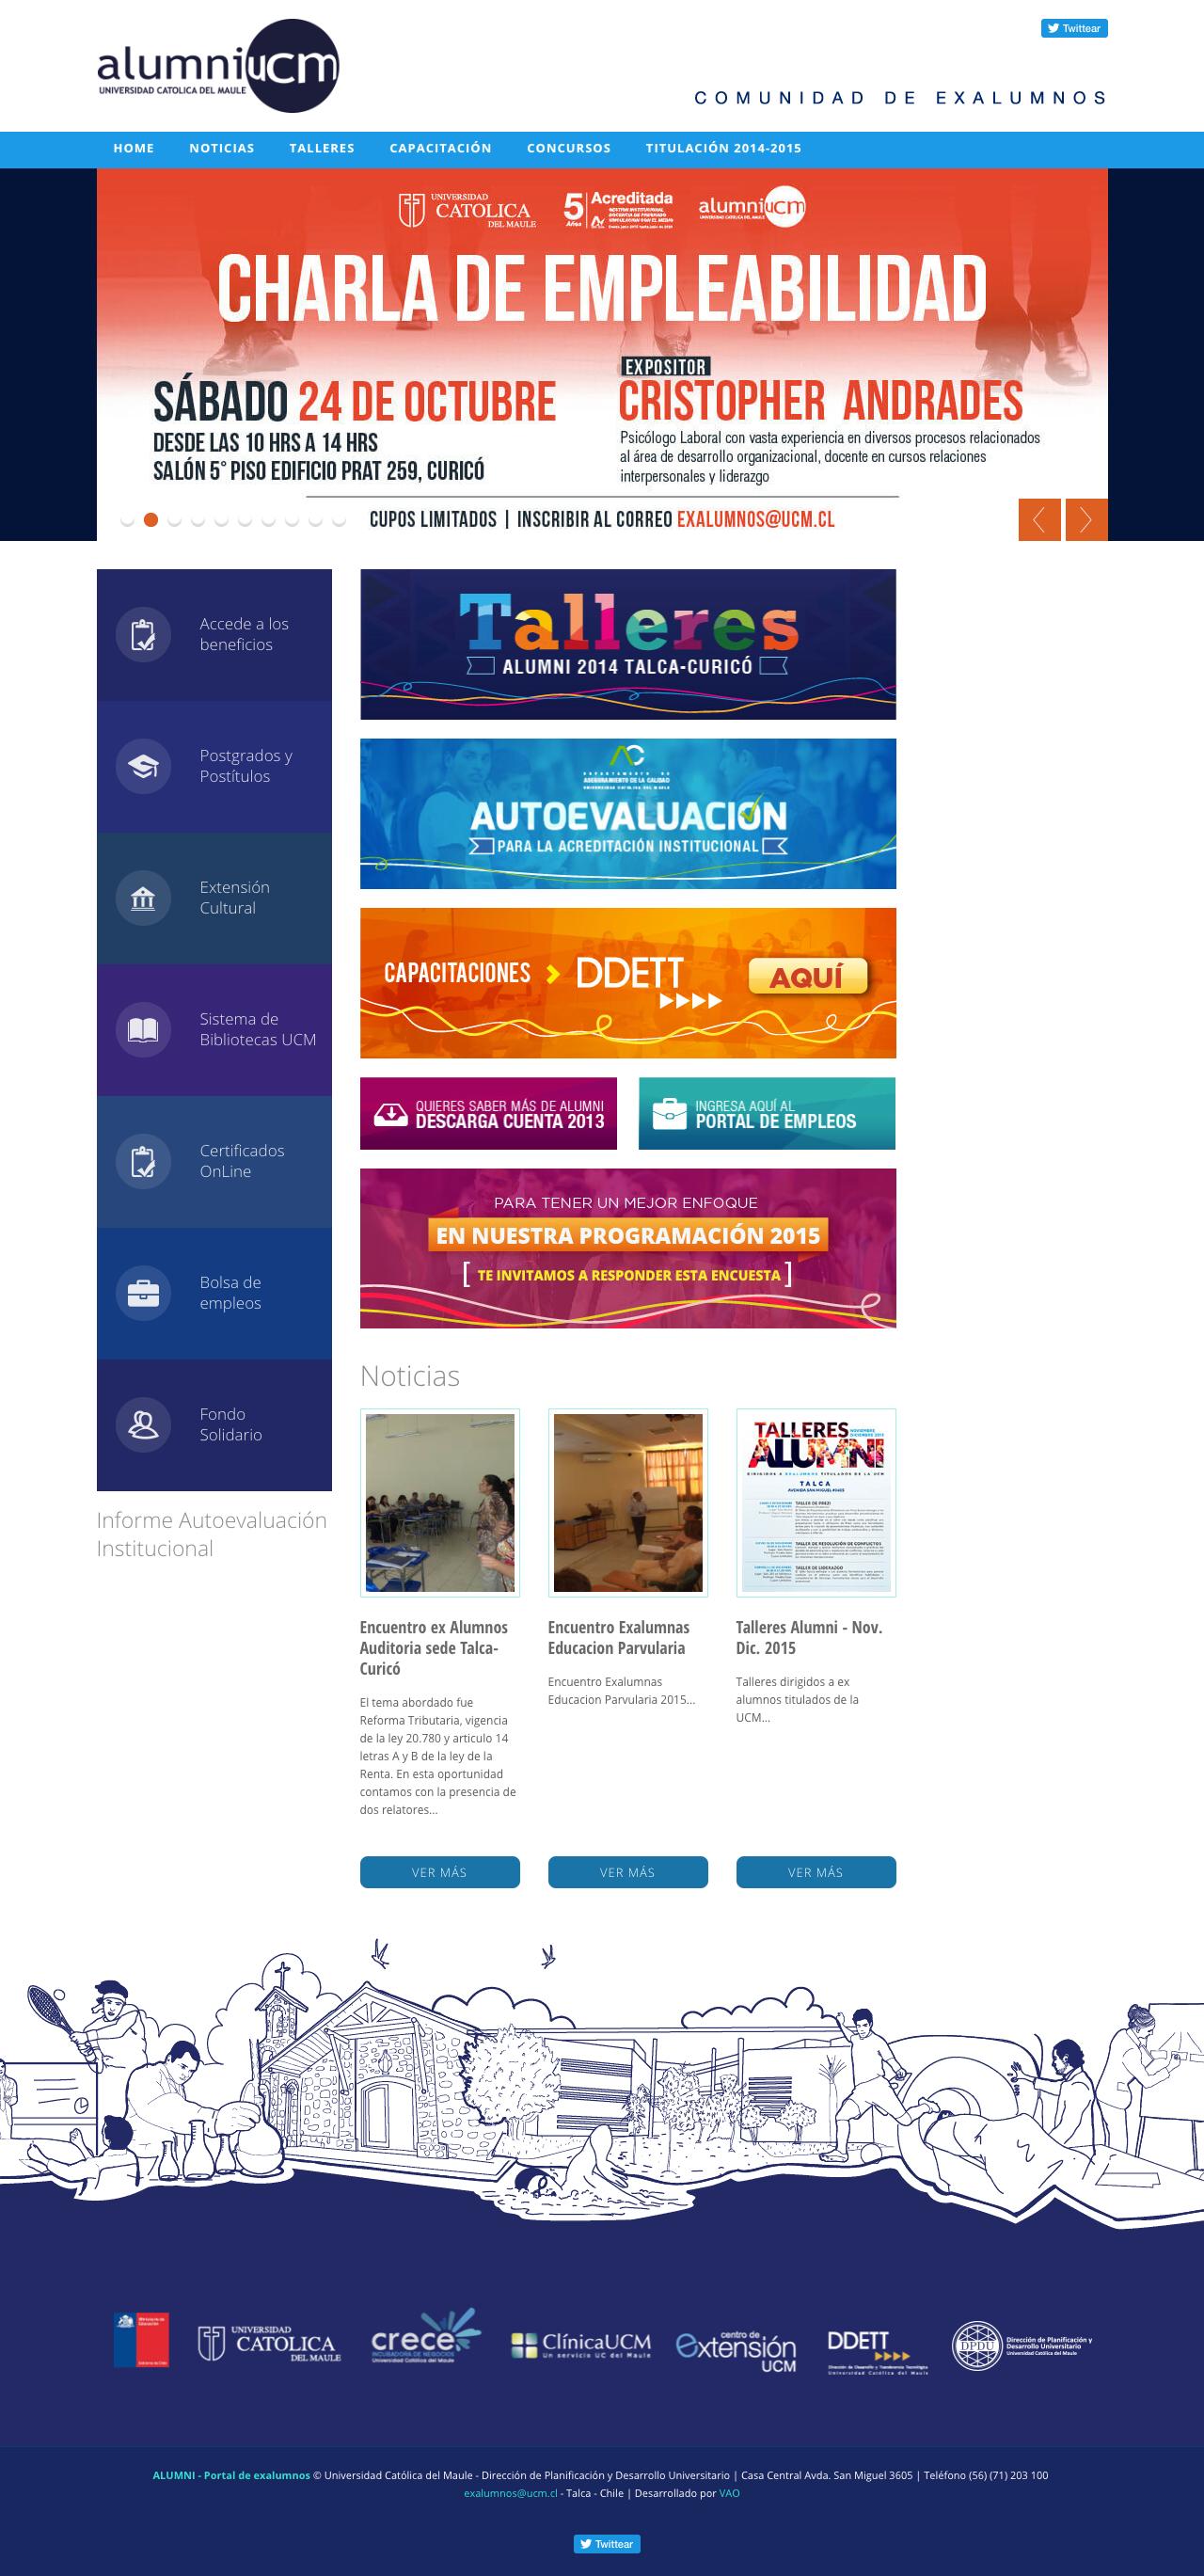 alumni UCM web